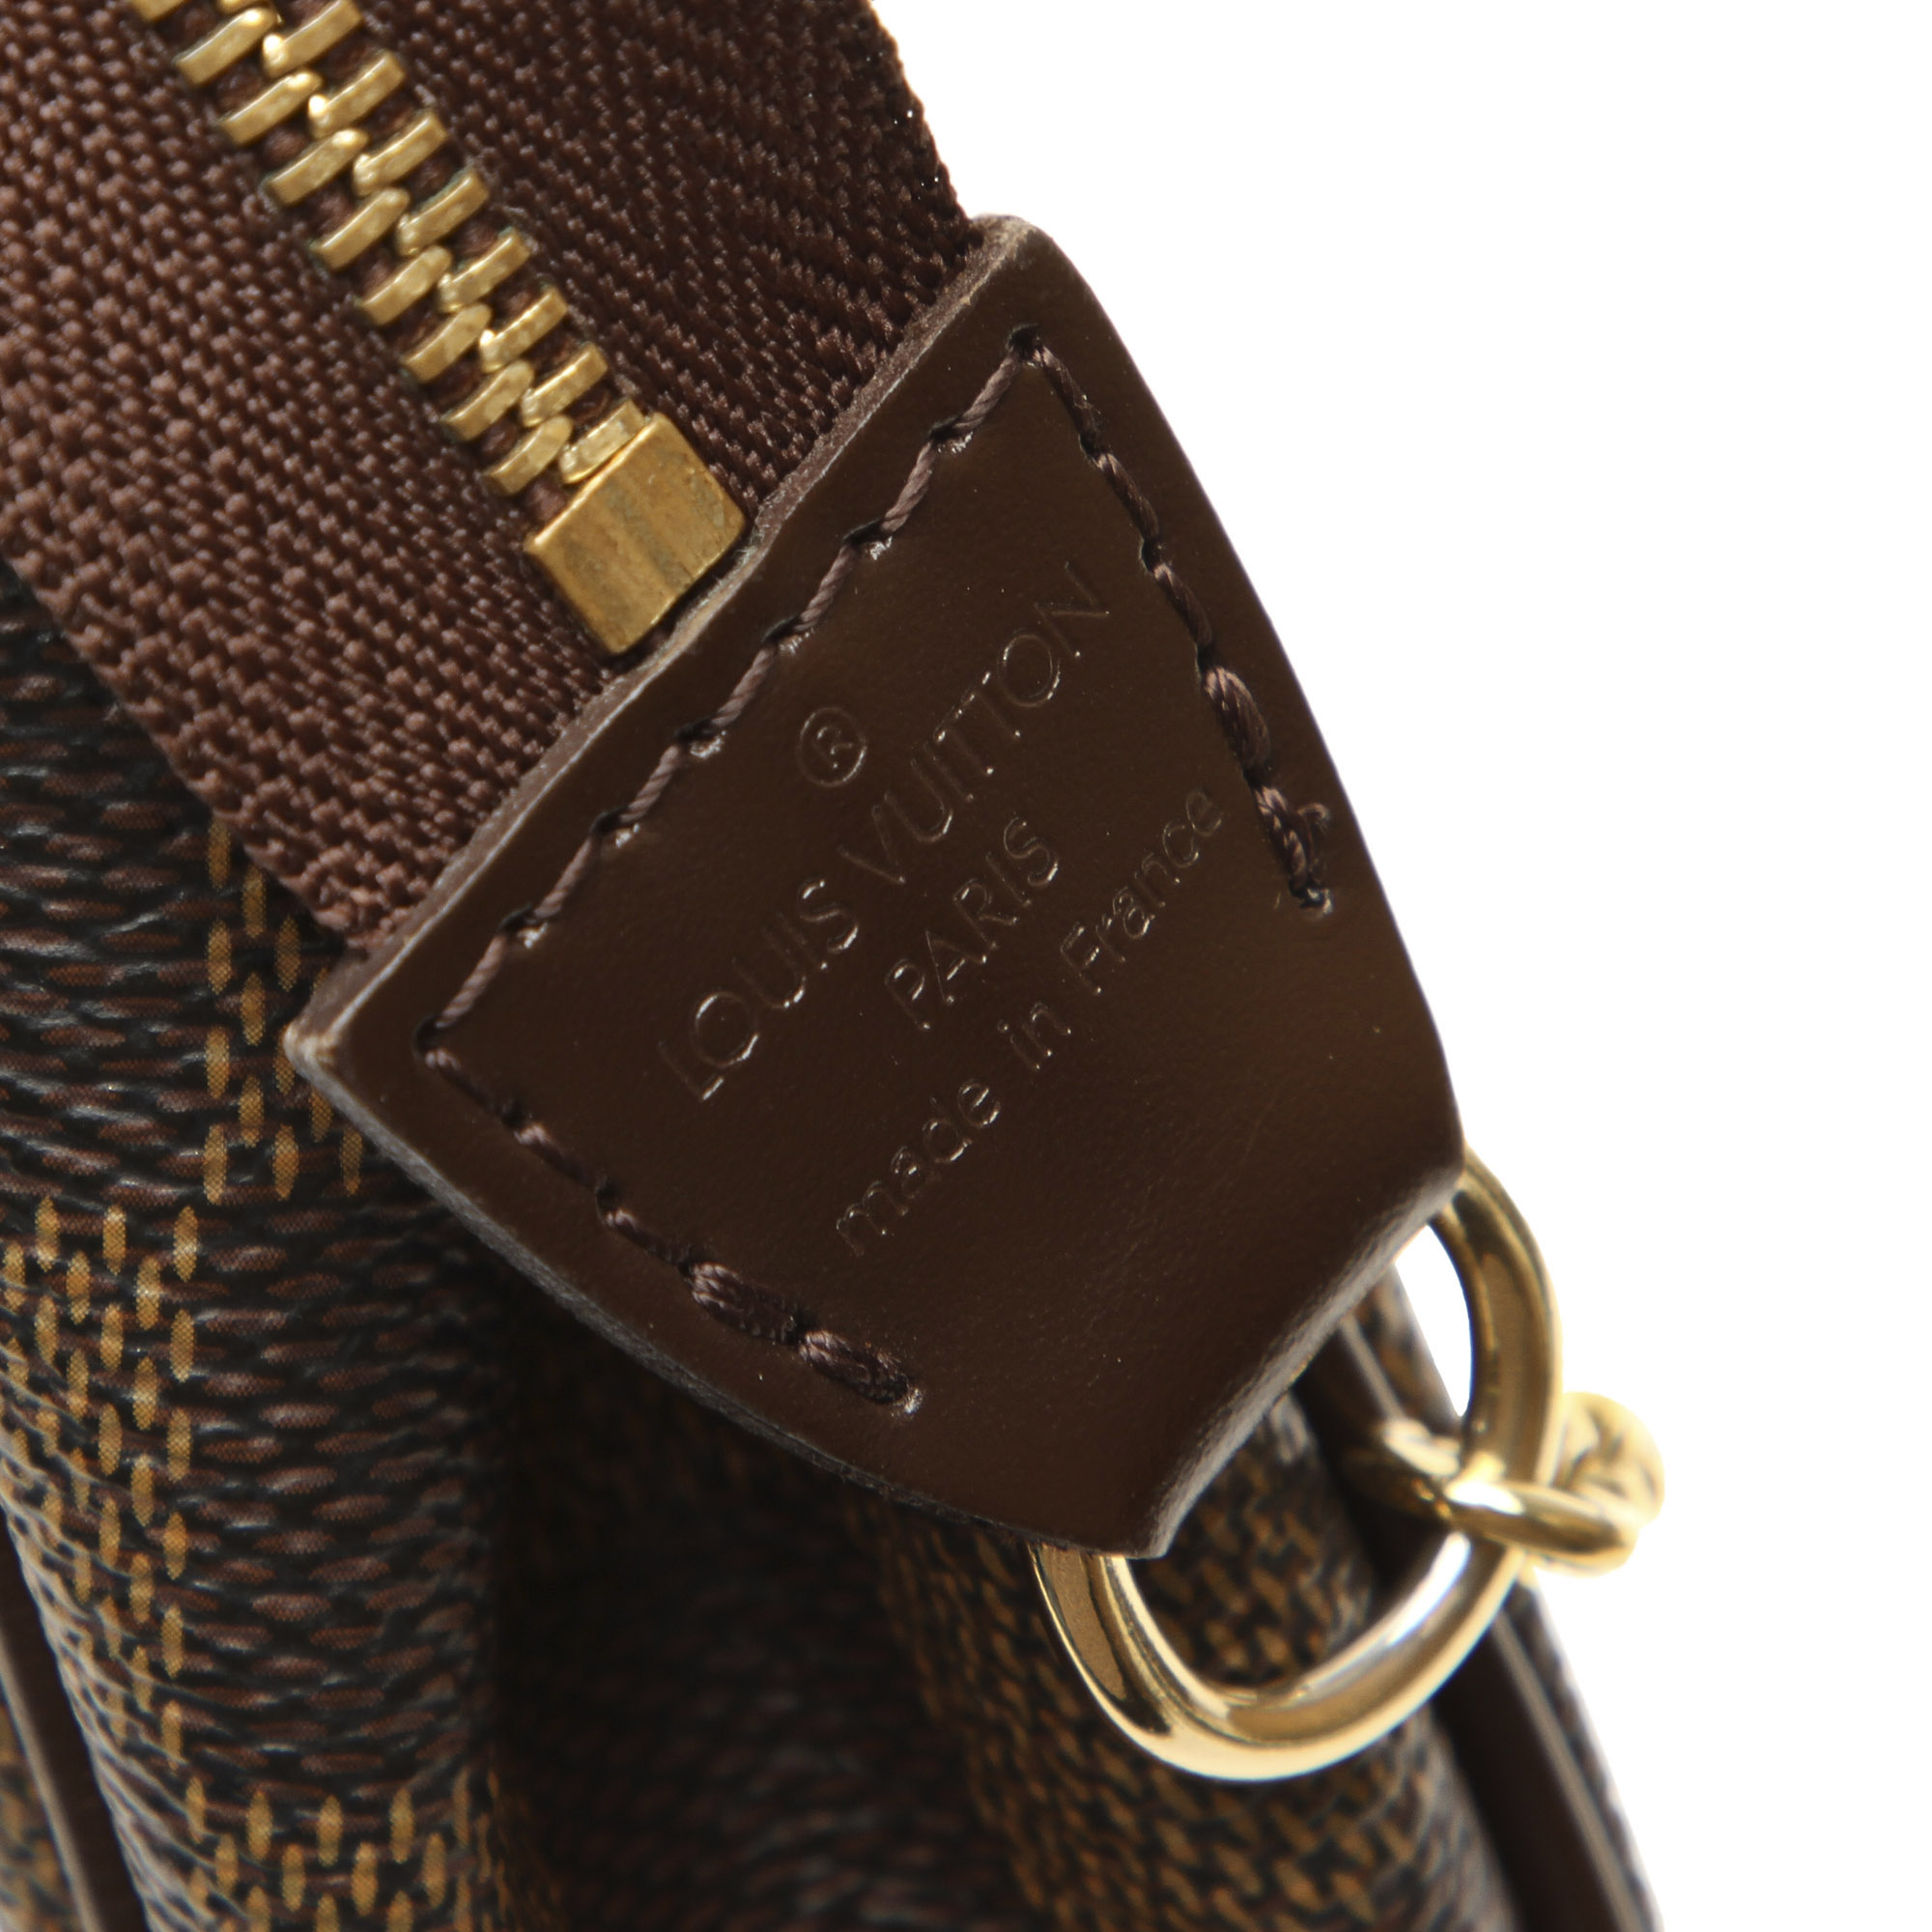 Louis Vuitton Damier Ebene Eva